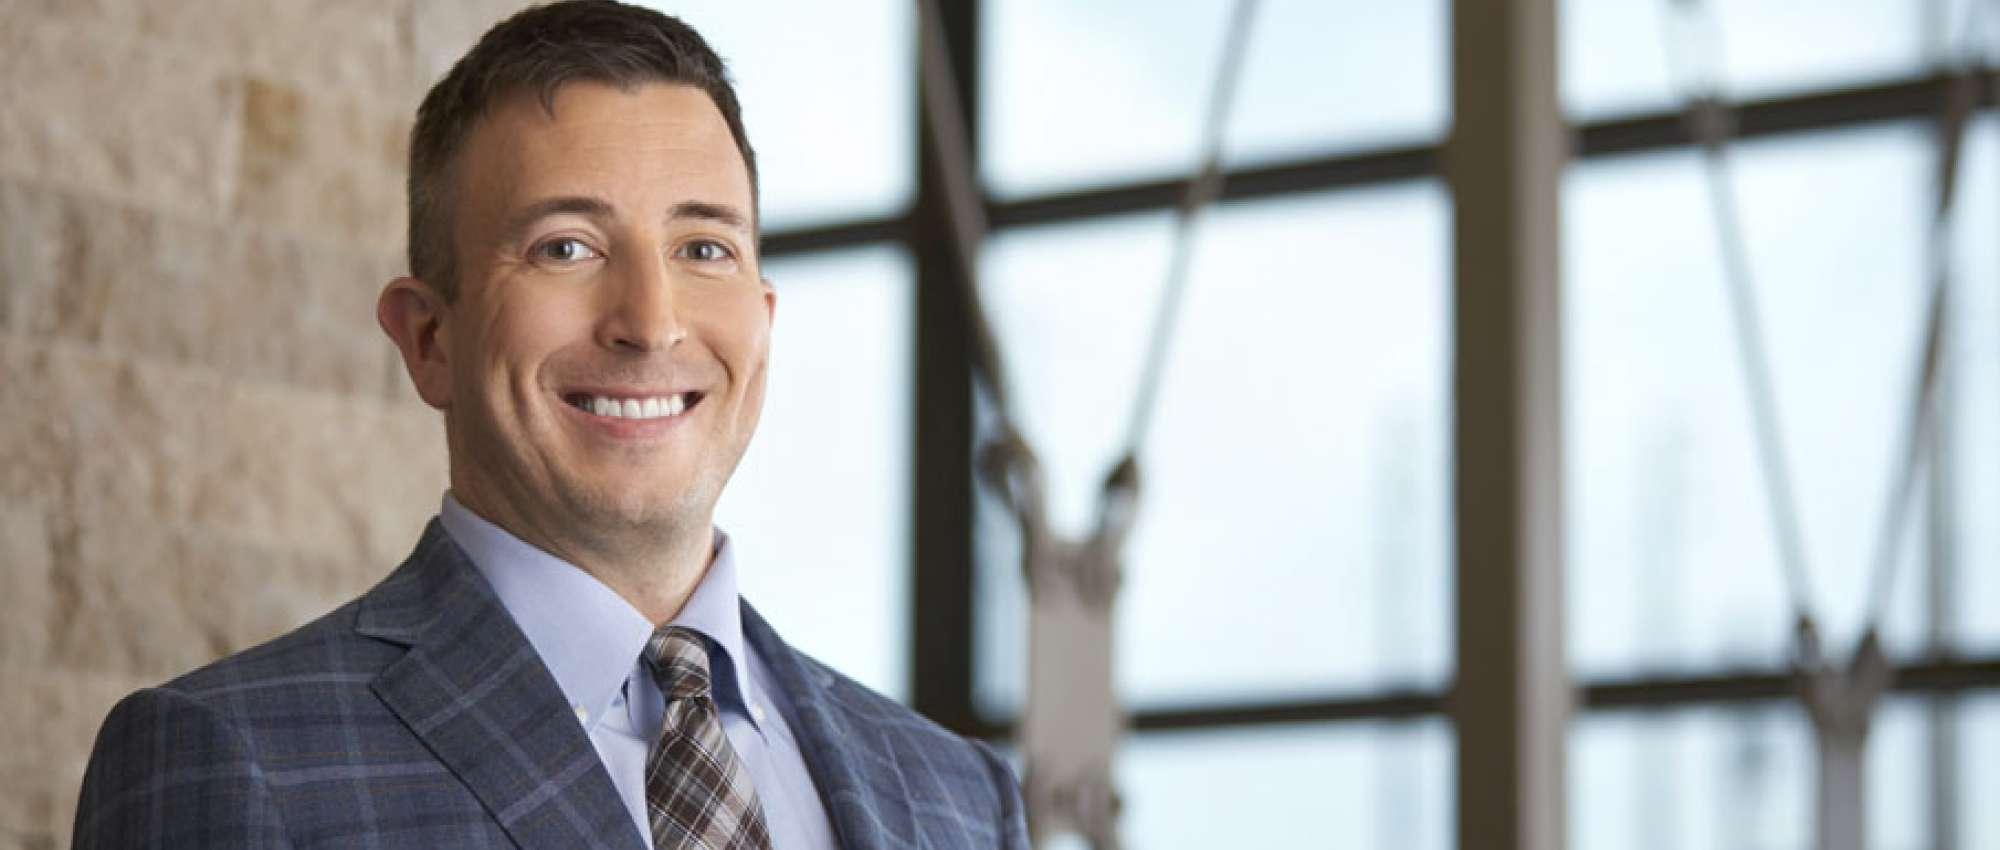 Meet Bryan Ashley's new Vice President of Sales